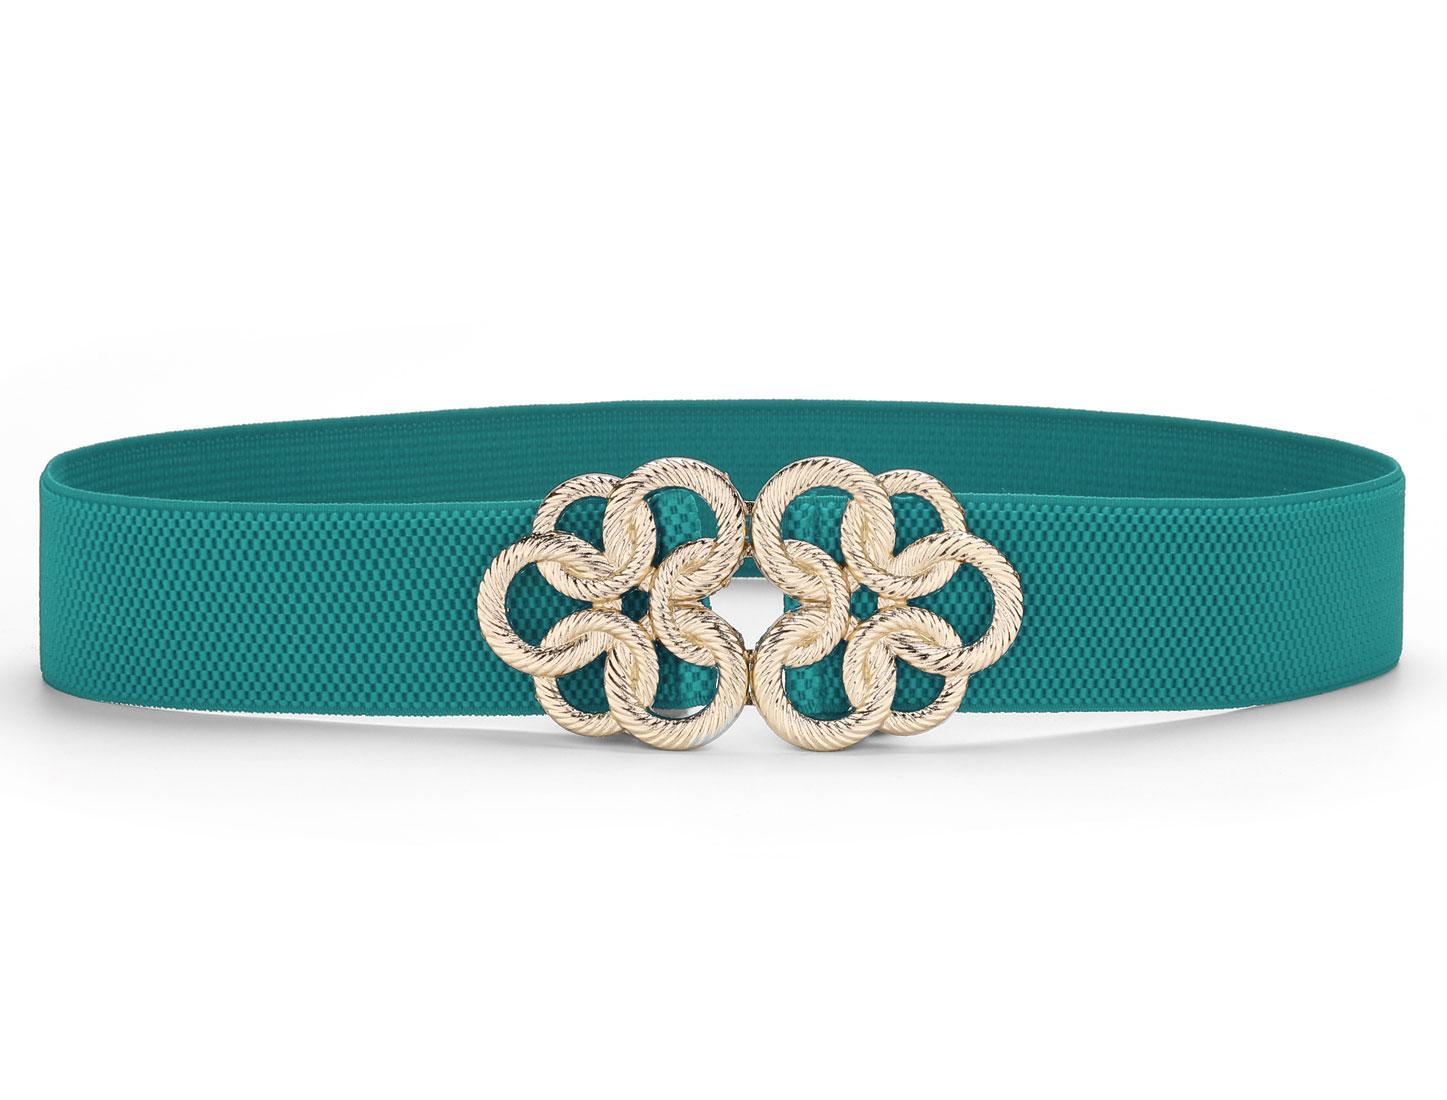 Metal Floral Interlock Buckle Stretch High Waist Belt Cyan for Ladies Woman